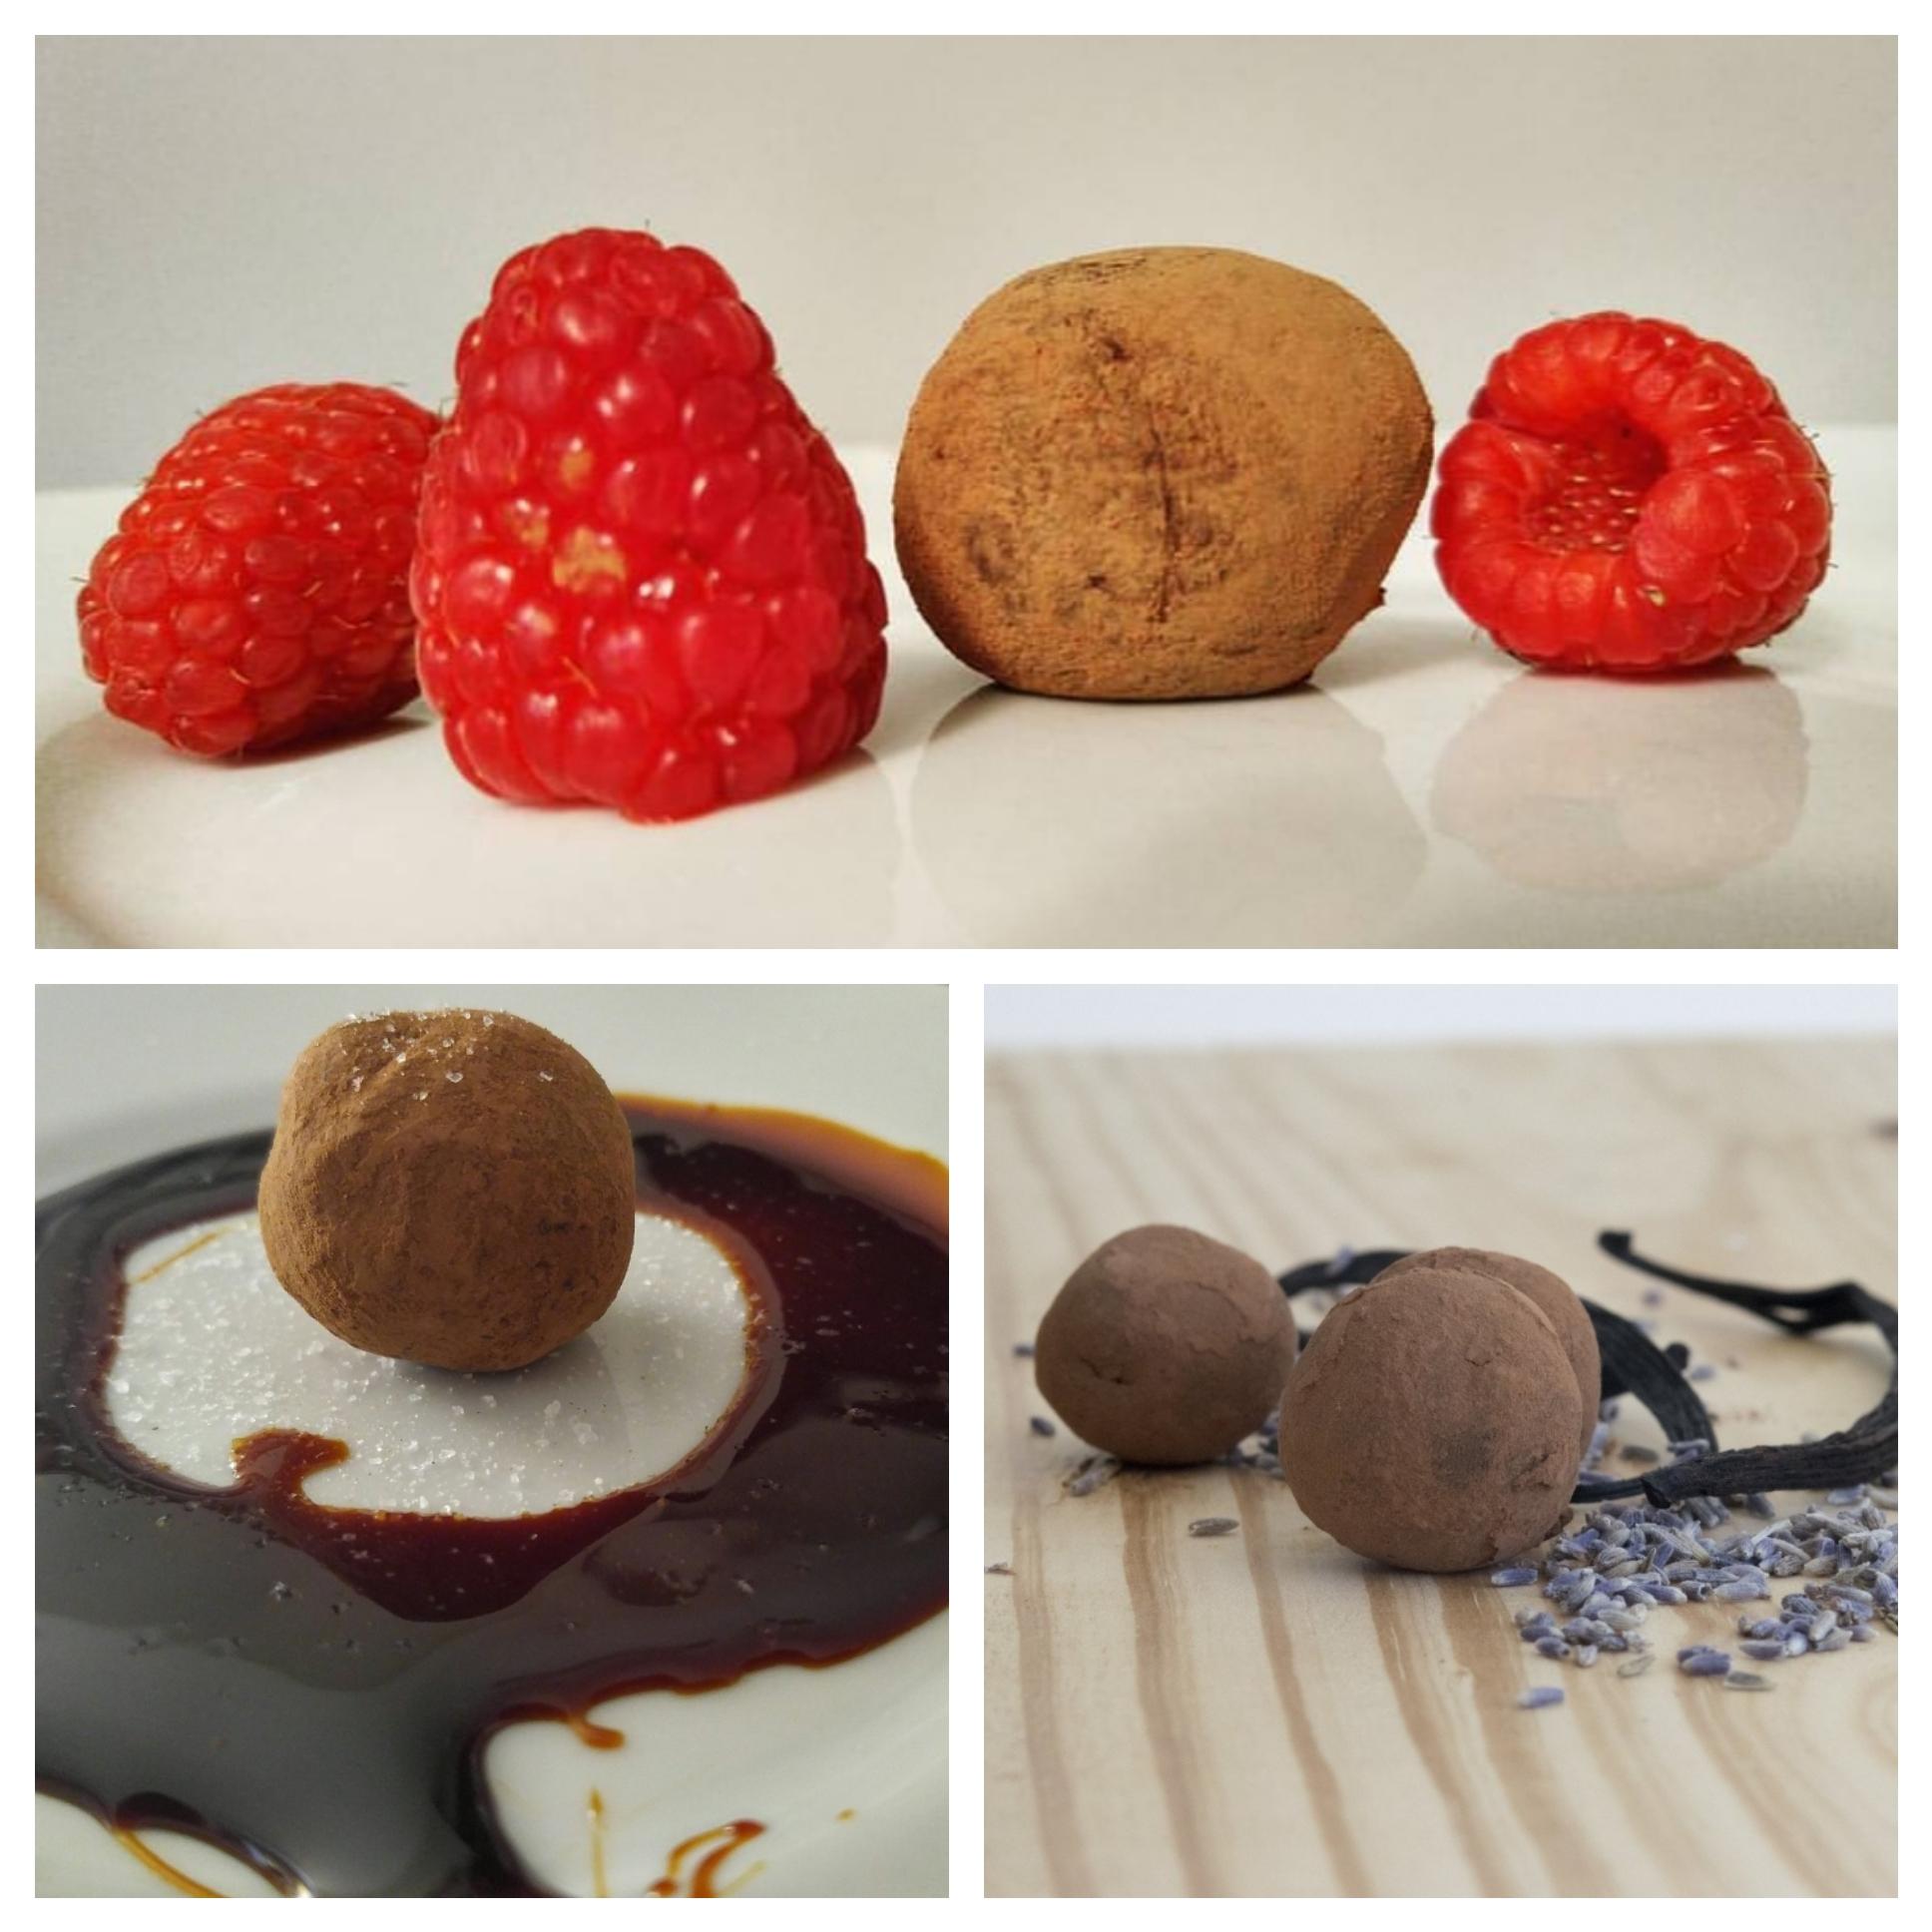 From Top: Raspberry Balsamic Vinegar, Burnt Caramel w/ Sea Salt, and Lavender Menace Truffles.